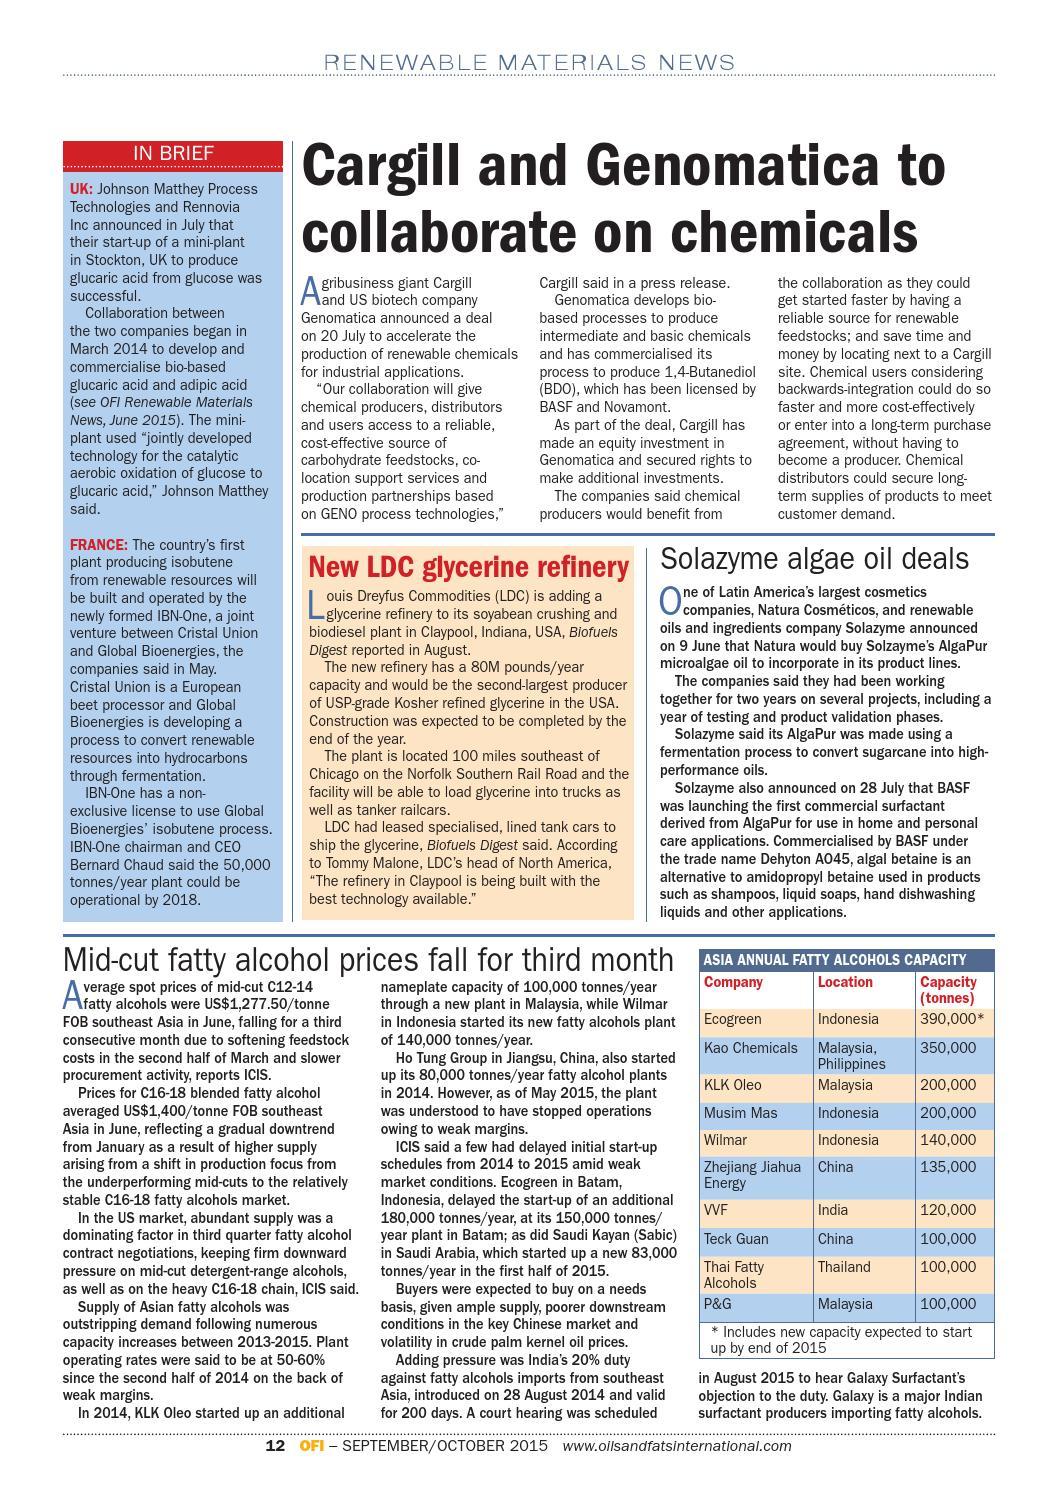 OFI September/October 2015 by Oils & Fats International - issuu